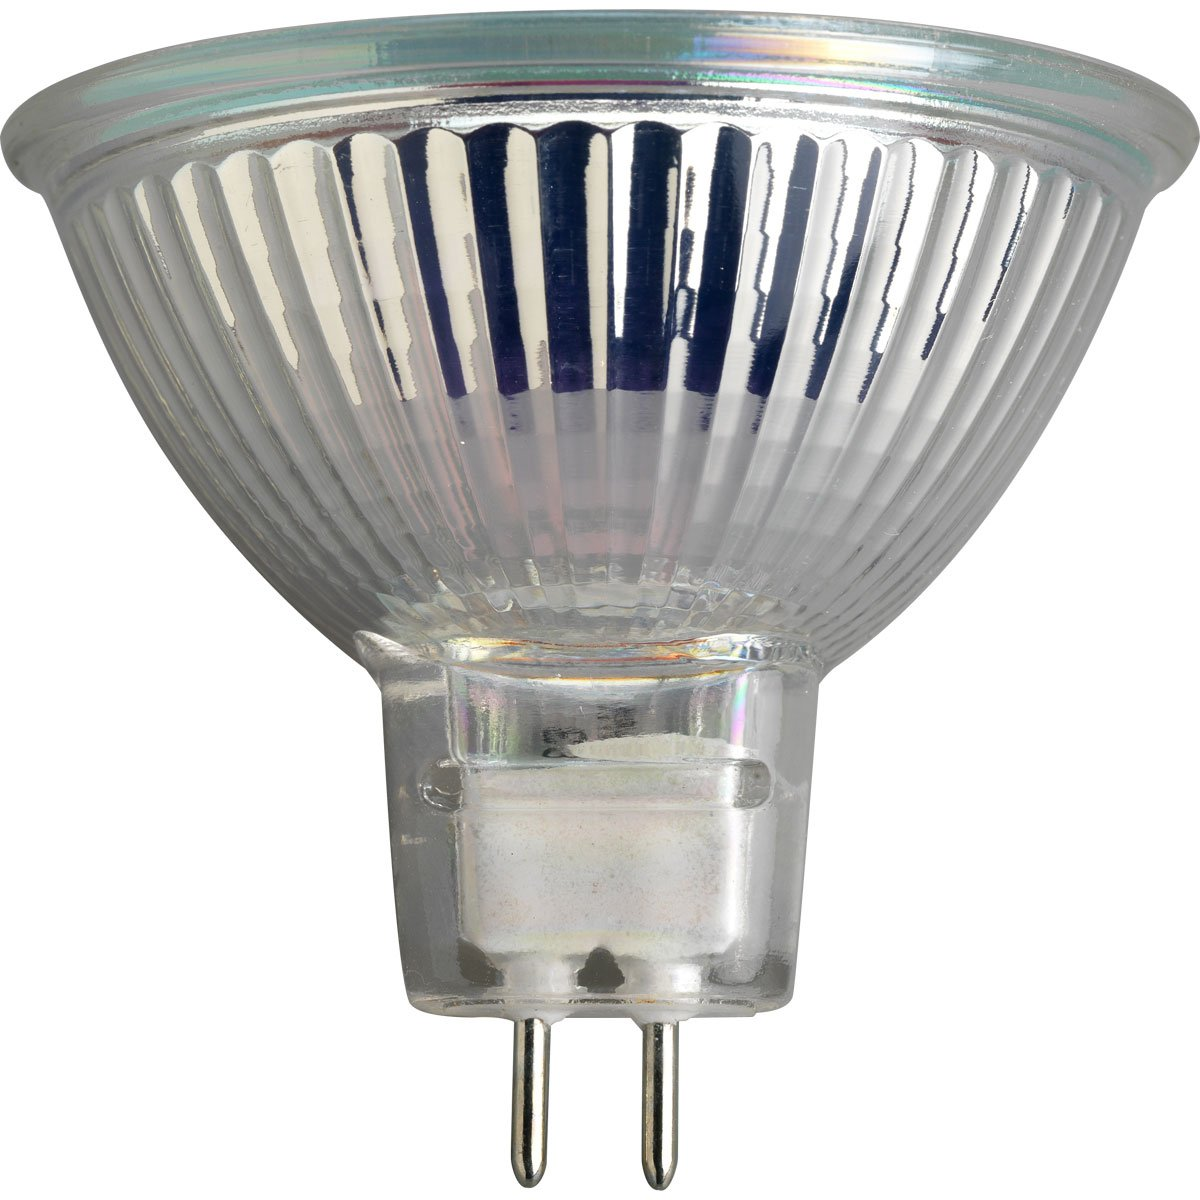 Progress Lighting P7831 01 50 watt MR16 Gu5 3 Bi Pin Base MFL Lamp